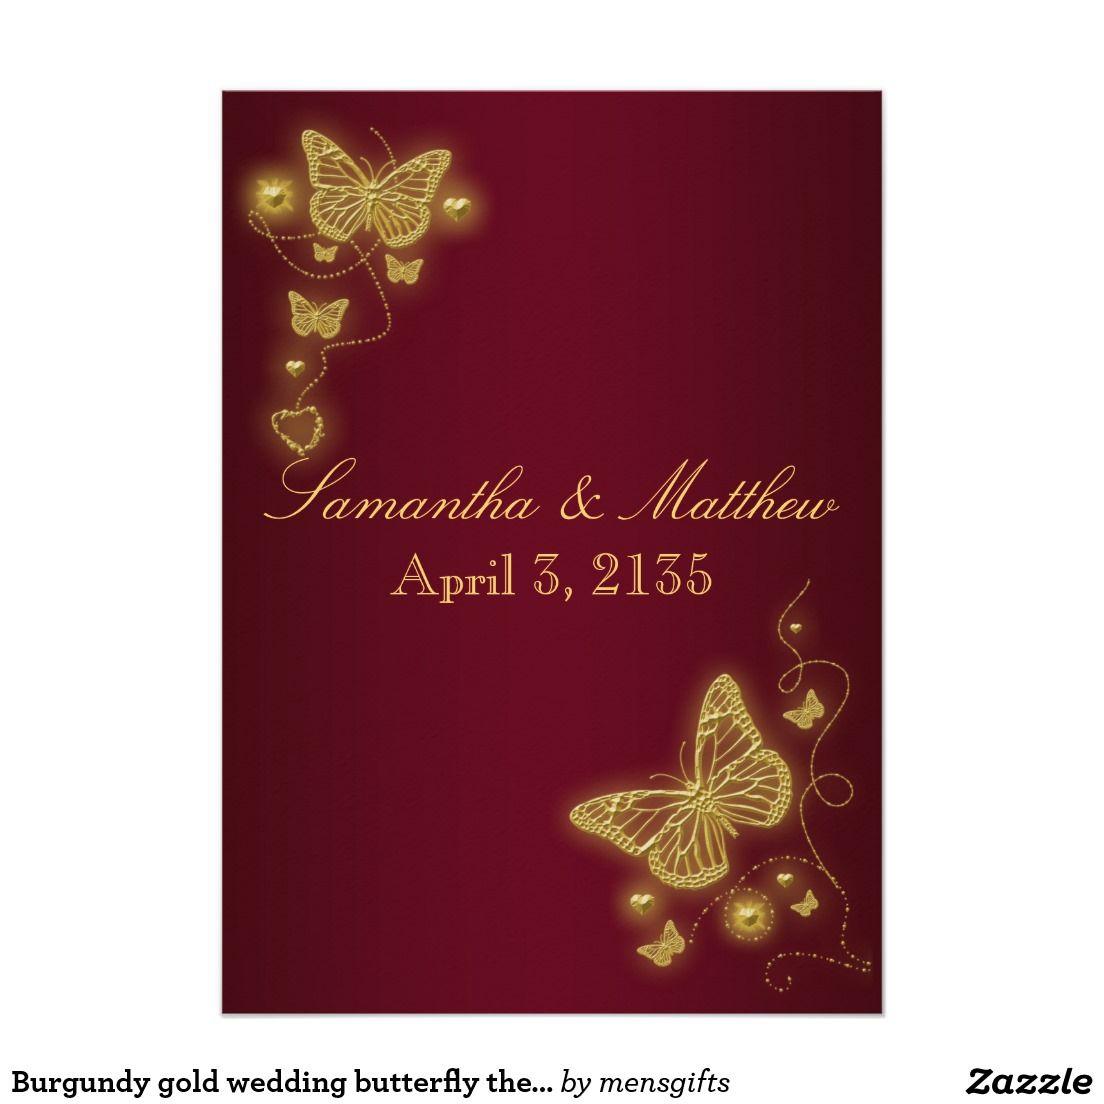 Burgundy gold wedding butterfly theme invitation   Wedding Stuff ...